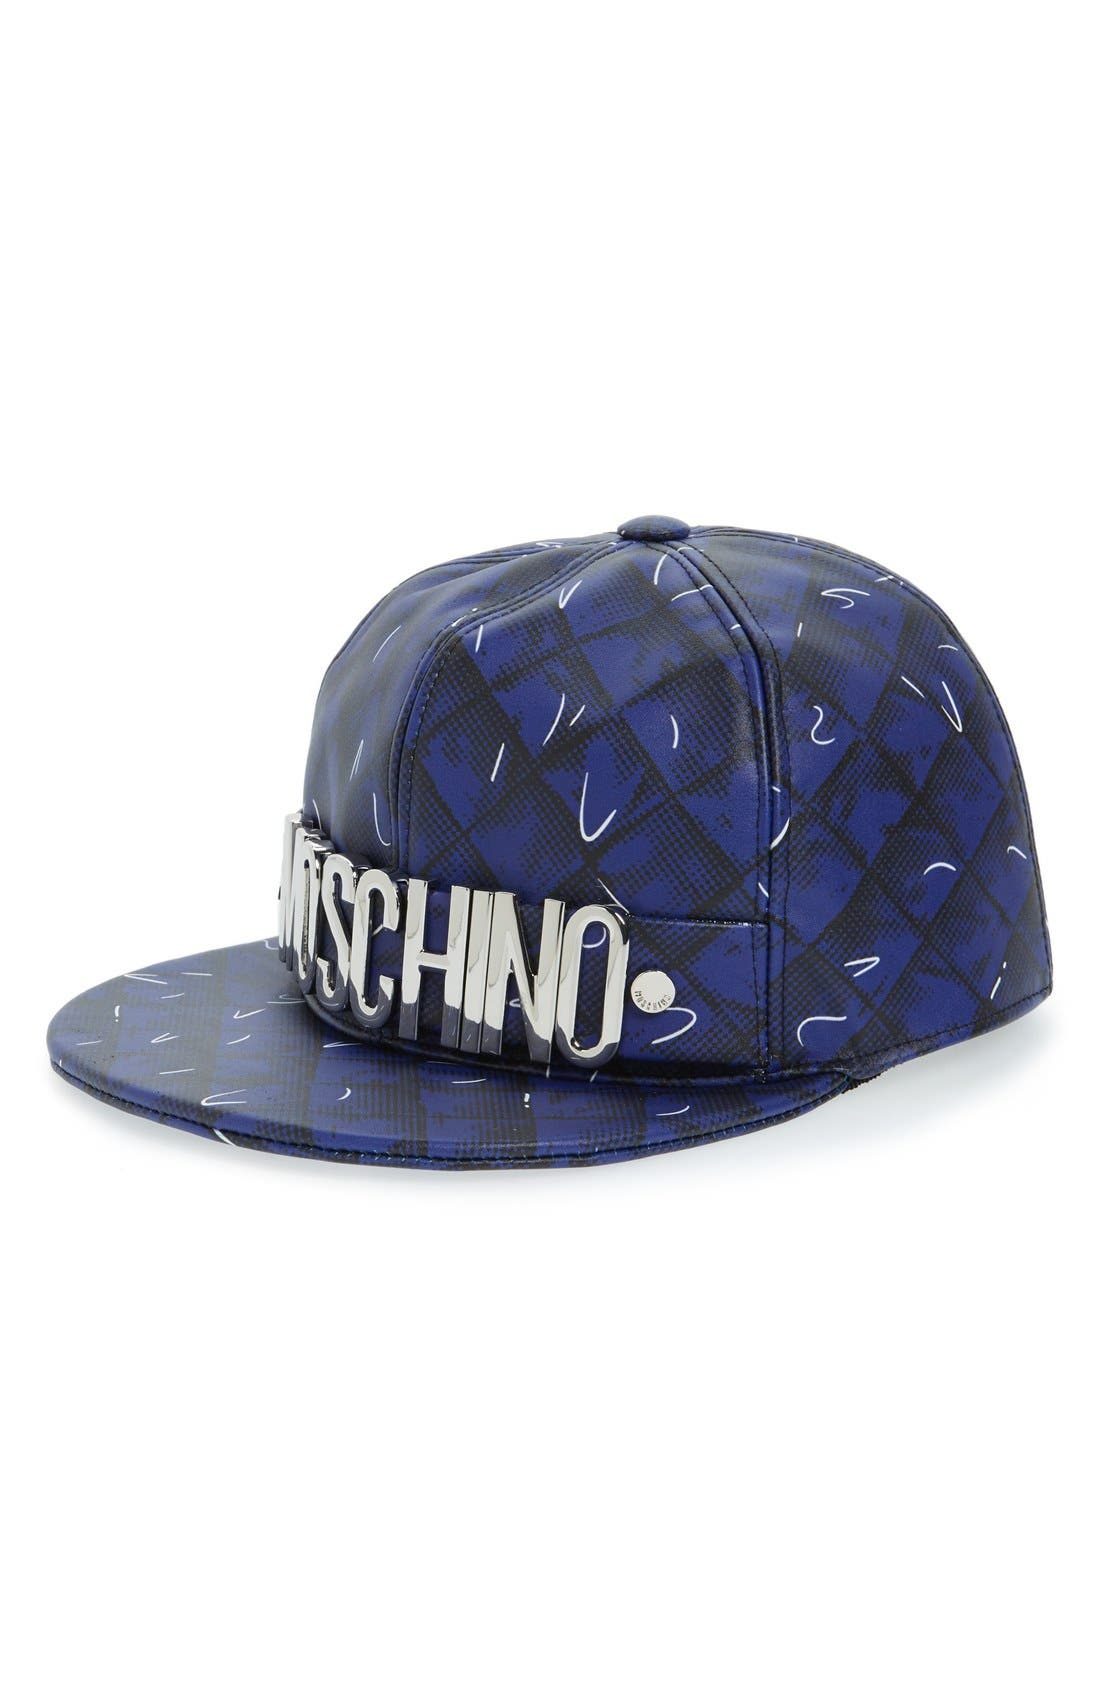 Main Image - Moschino 'Shadow' Leather Baseball Cap